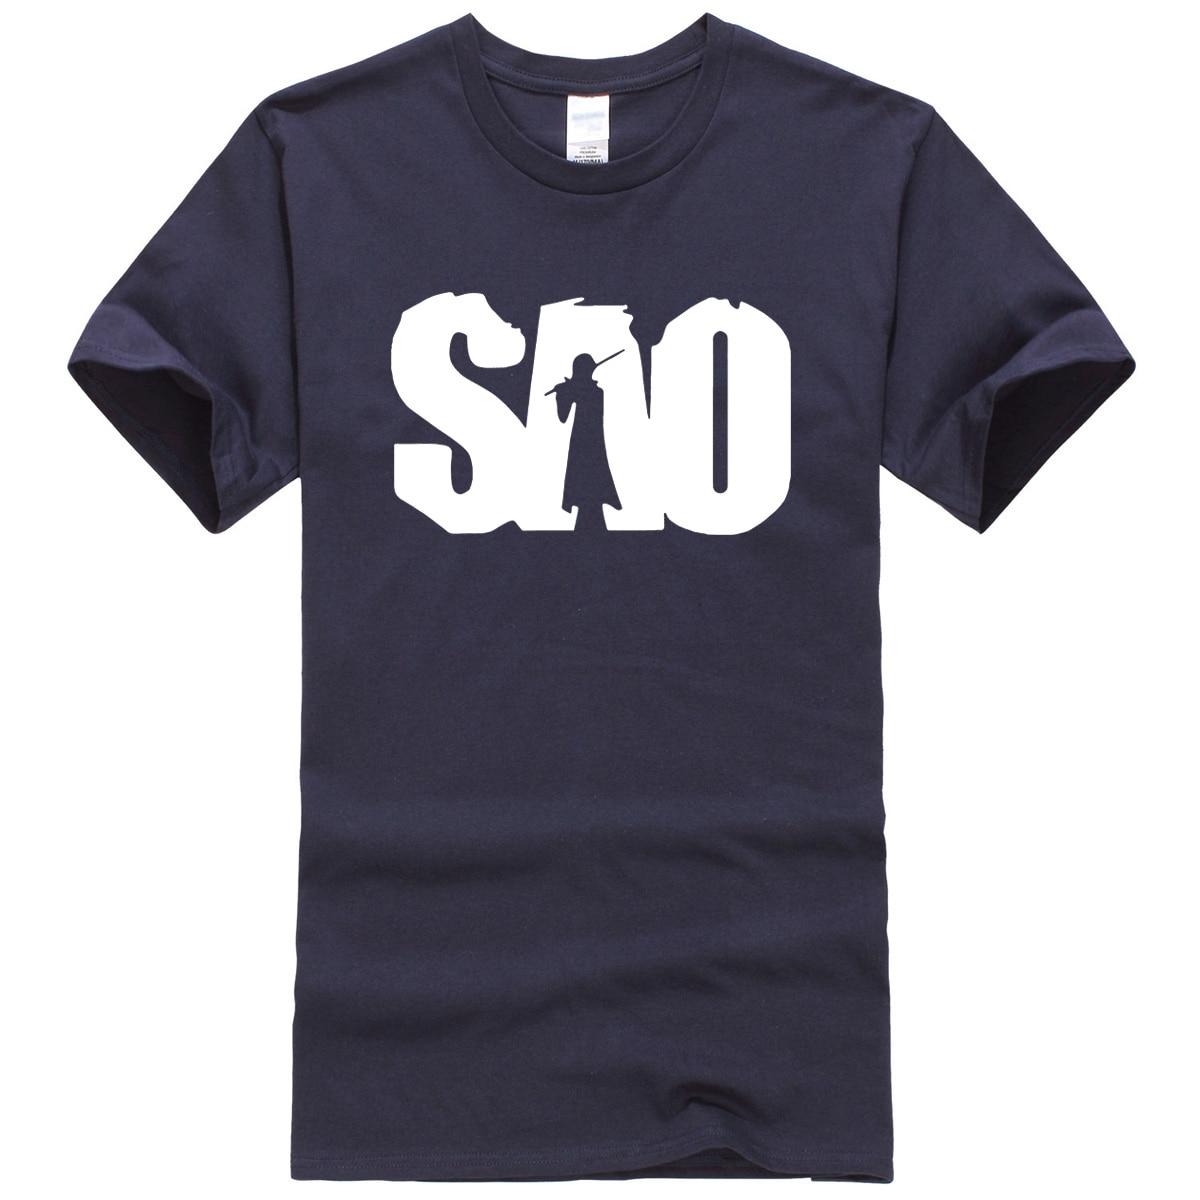 SAO anime printed summer 2019 men's T-shirts 100% cotton clothes fashion casual t shirt brand clothing jersey top kpop T-shirt